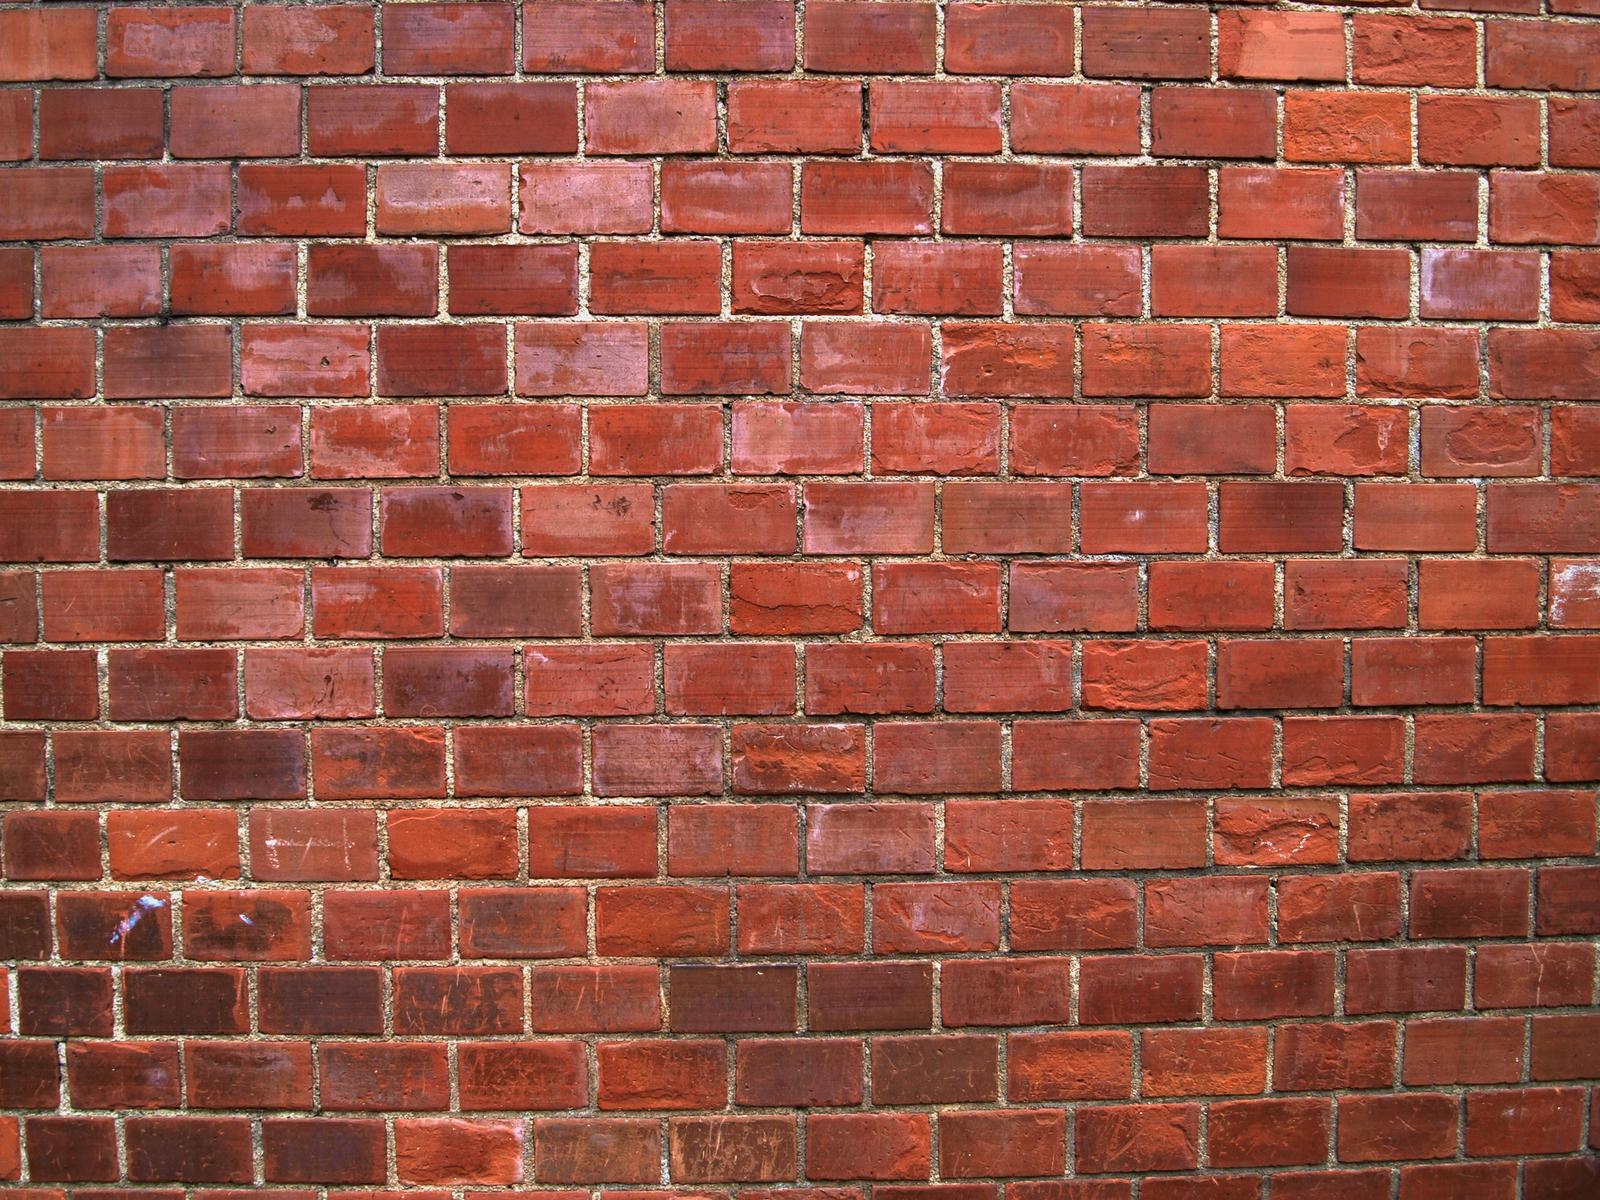 5 Variations Of Old Red Brick Wall | ReUsage